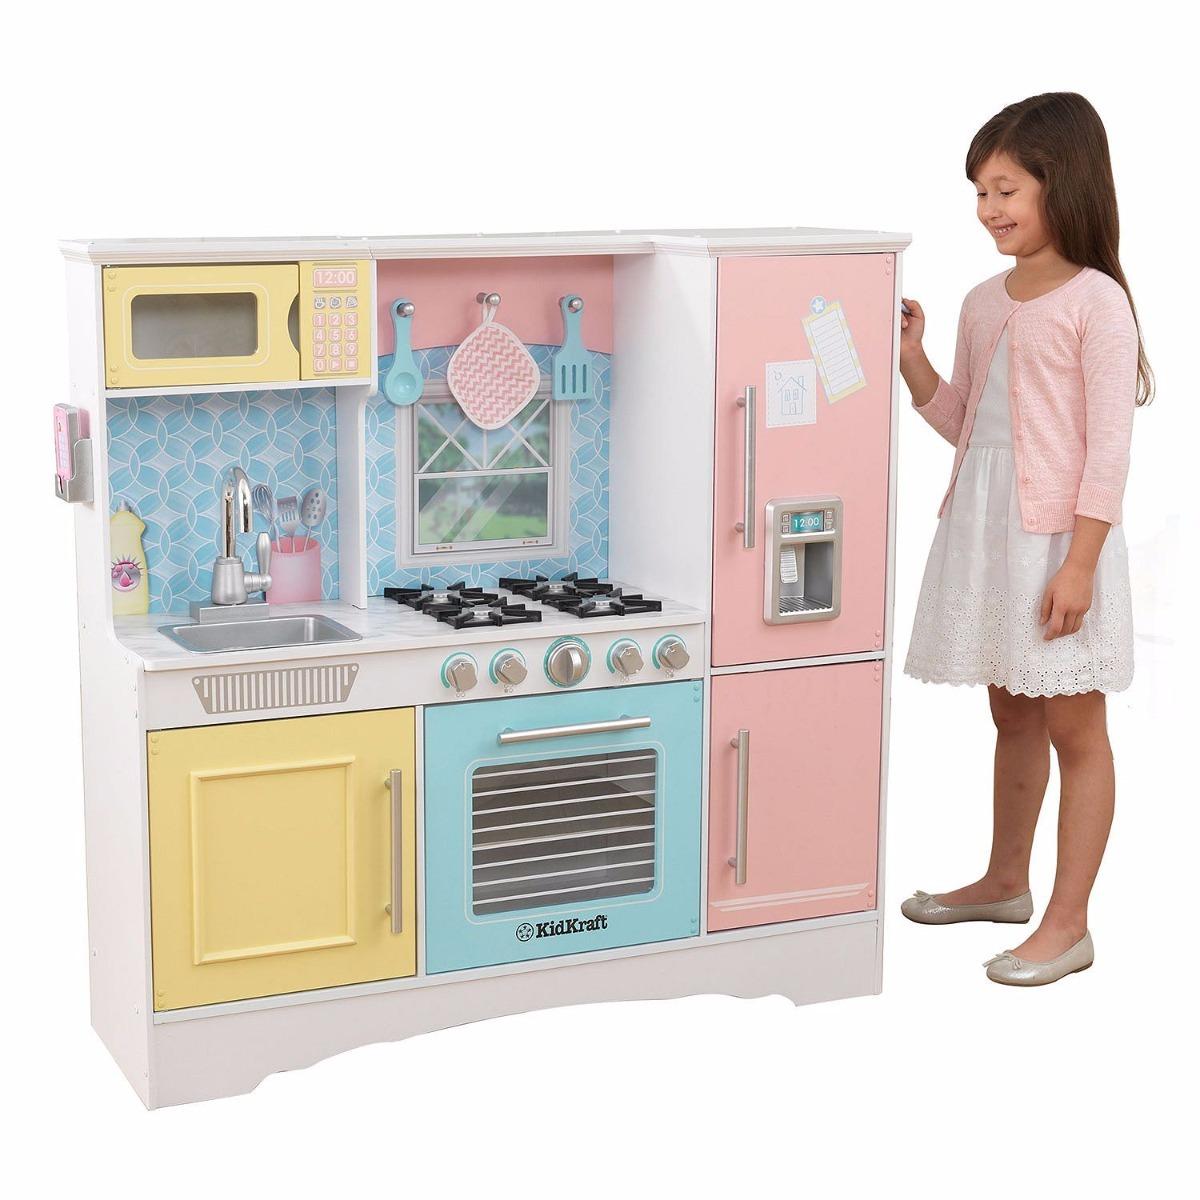 Cocina cl sica de juego para ni as con accesorios kidkraft - Cocinas de ninas ...